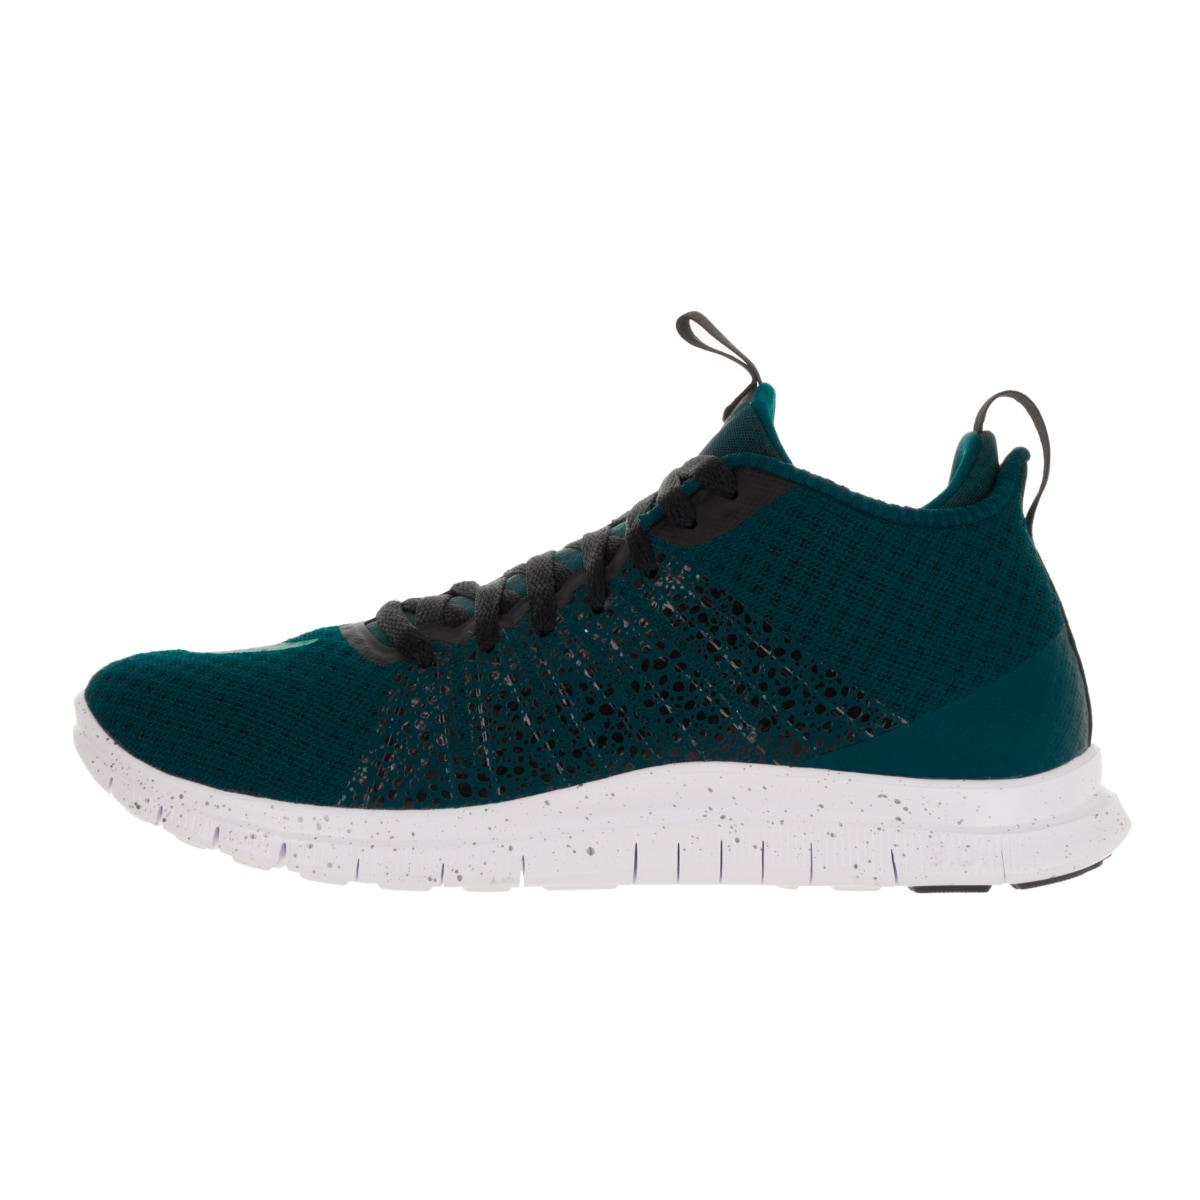 a66c499fdb83 Shop Nike Men's Free Hypervenom 2 FC Turquoise/Black/White Training Shoe -  Free Shipping Today - Overstock - 13404775